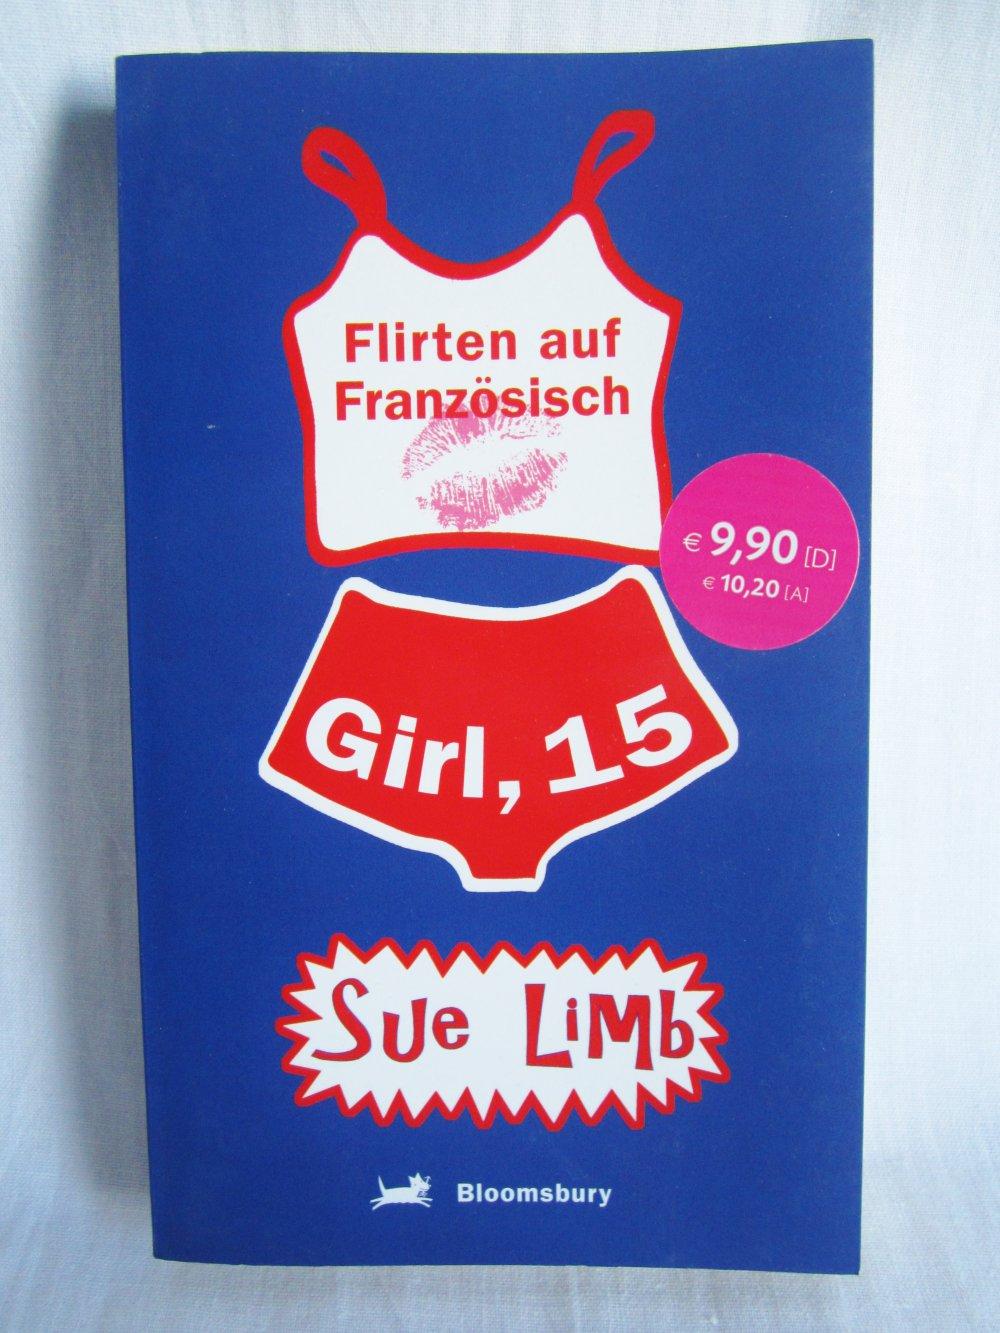 congratulate, magnificent idea Single Frauen Altenburg kennenlernen pity, that now can